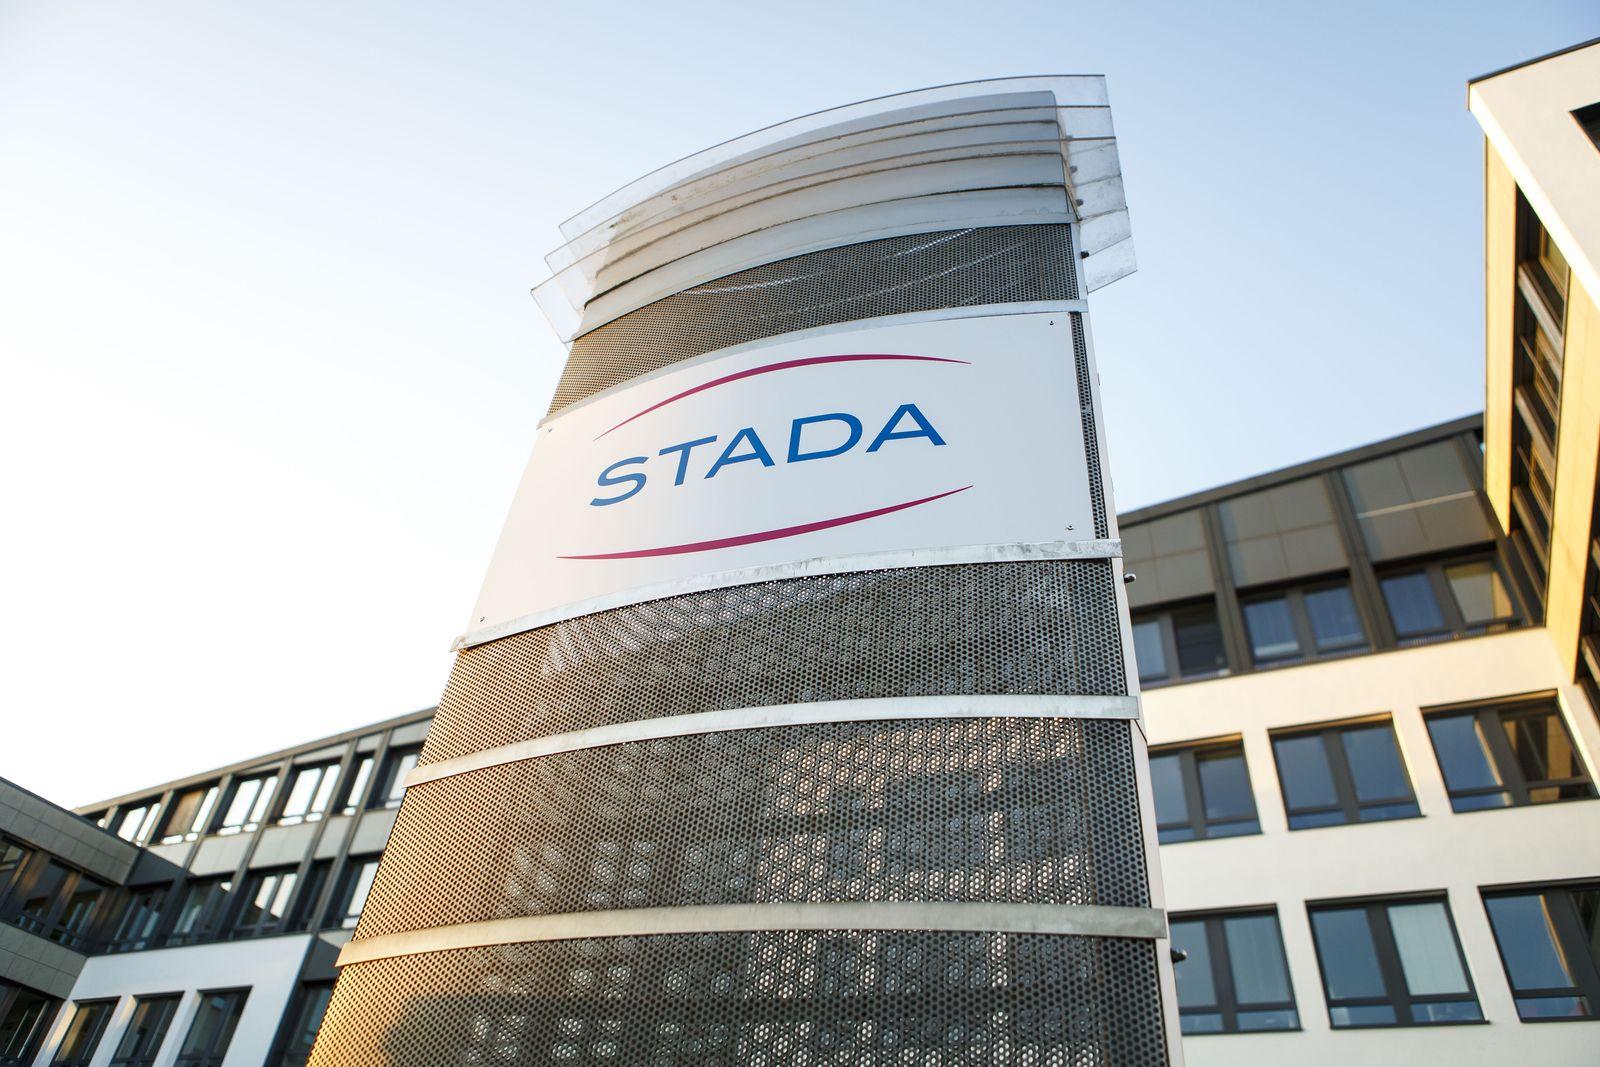 STADA Hauptsitz Bad Vilbel